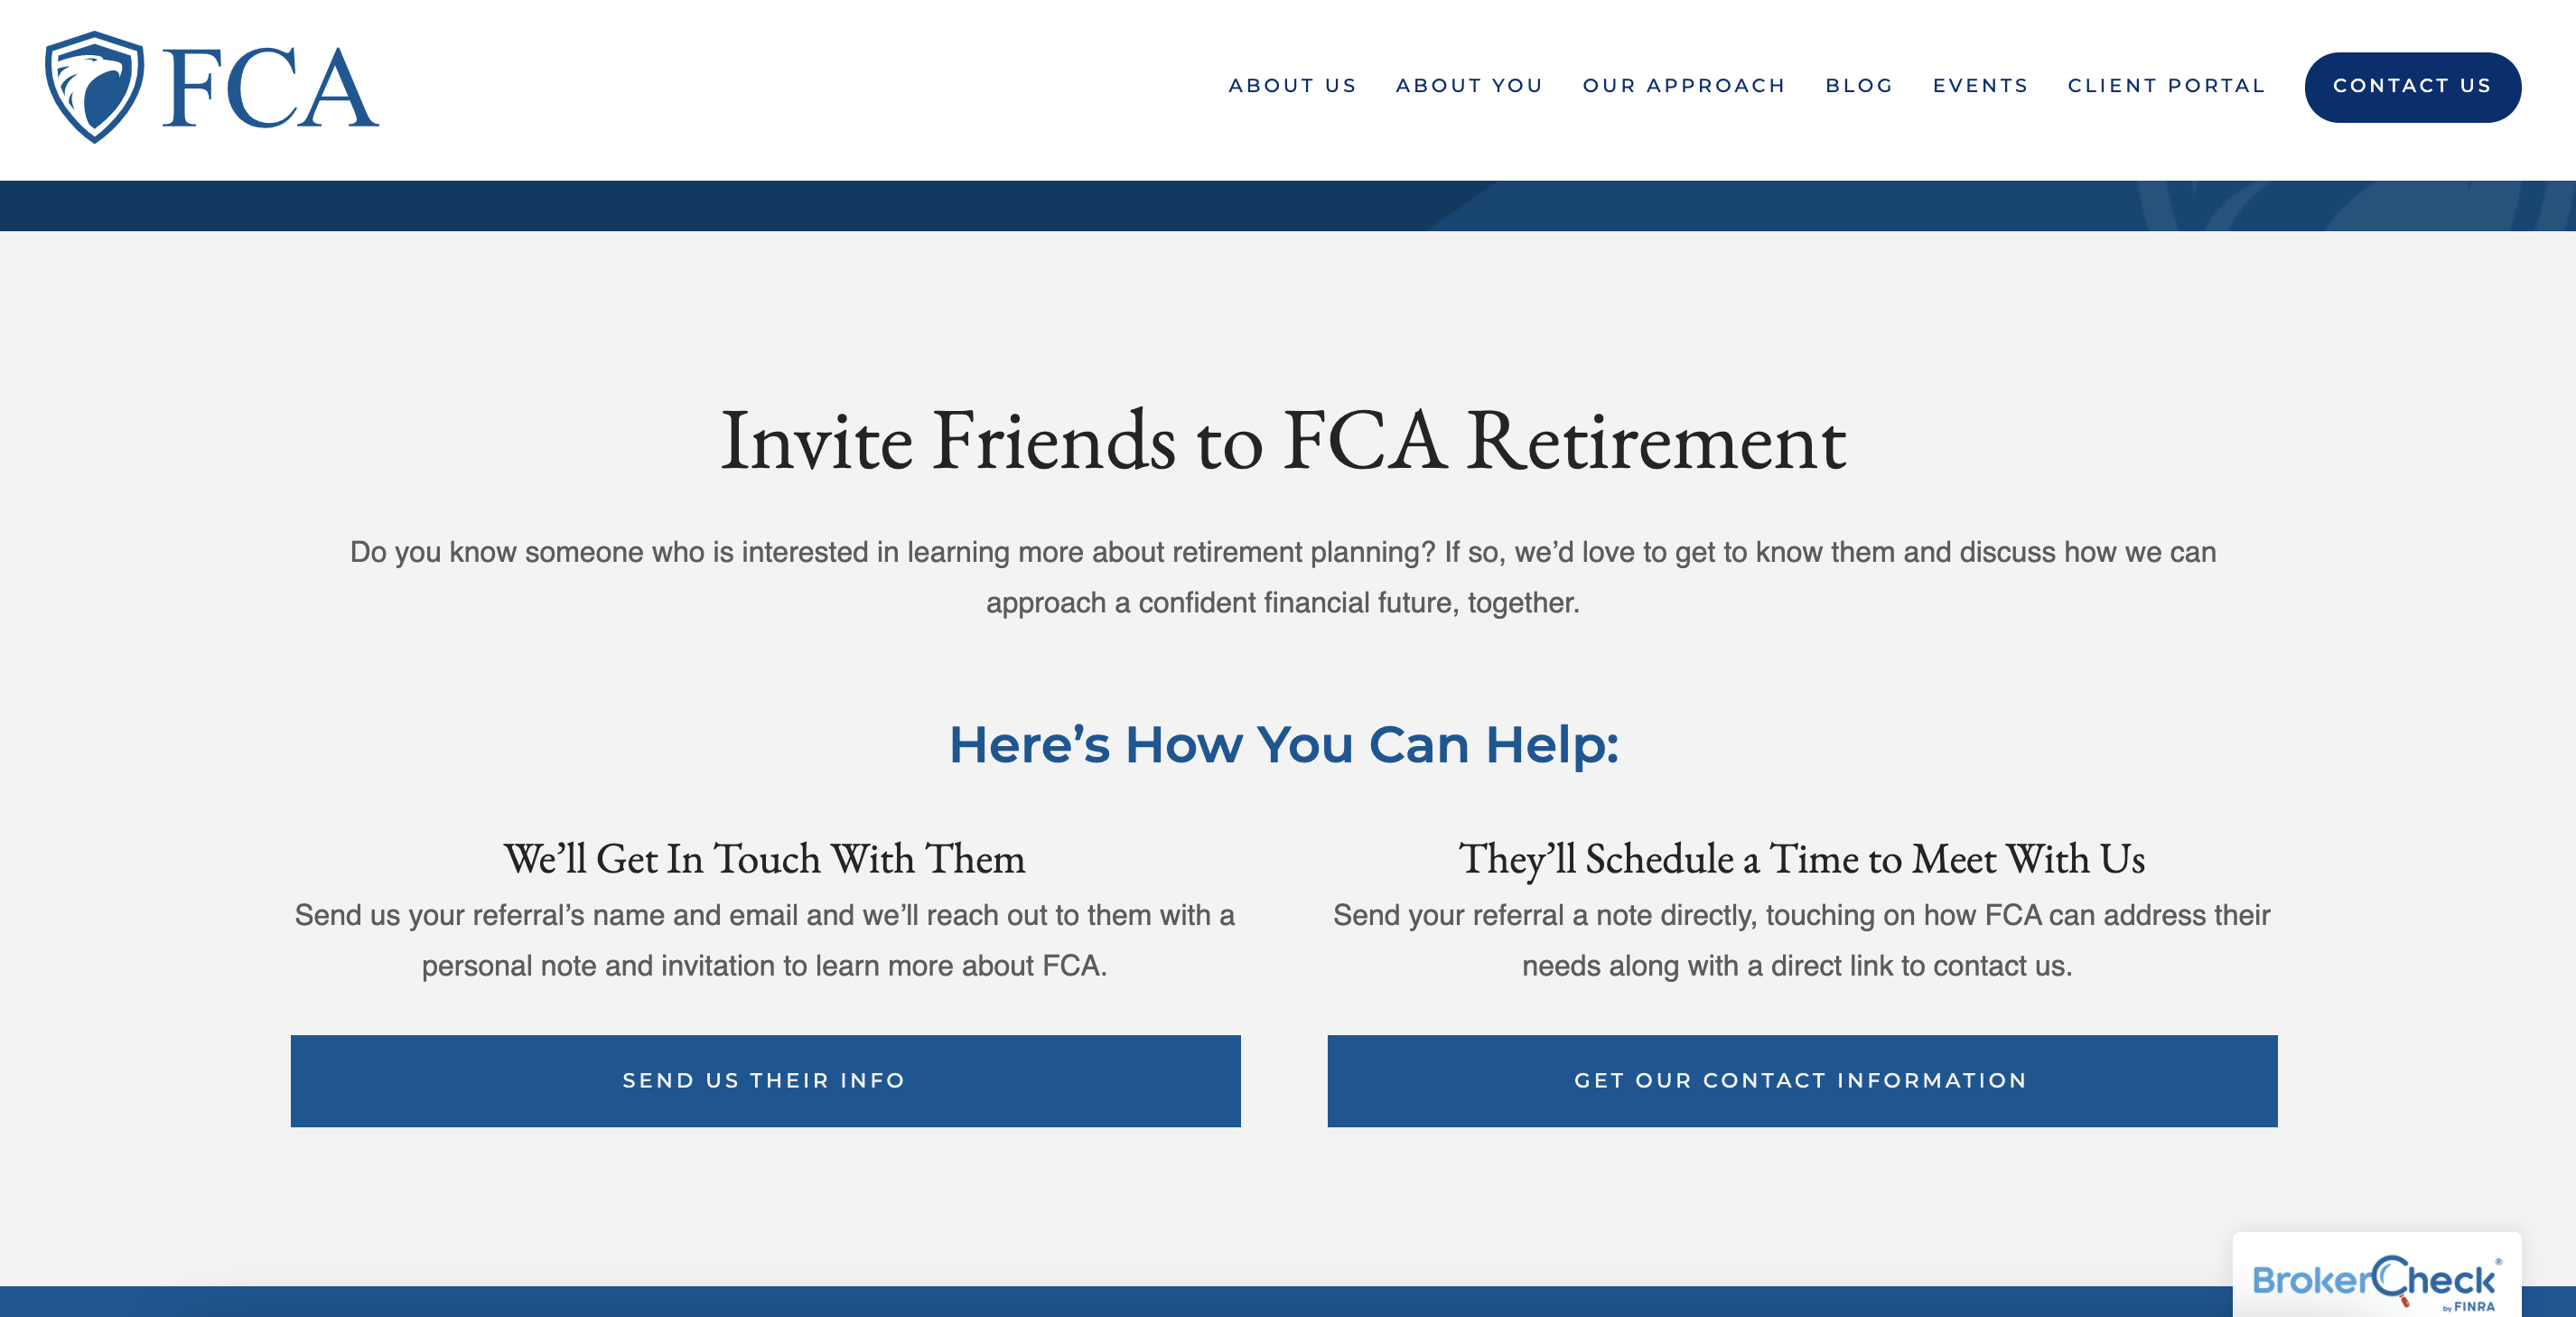 FCA Retirement landing page